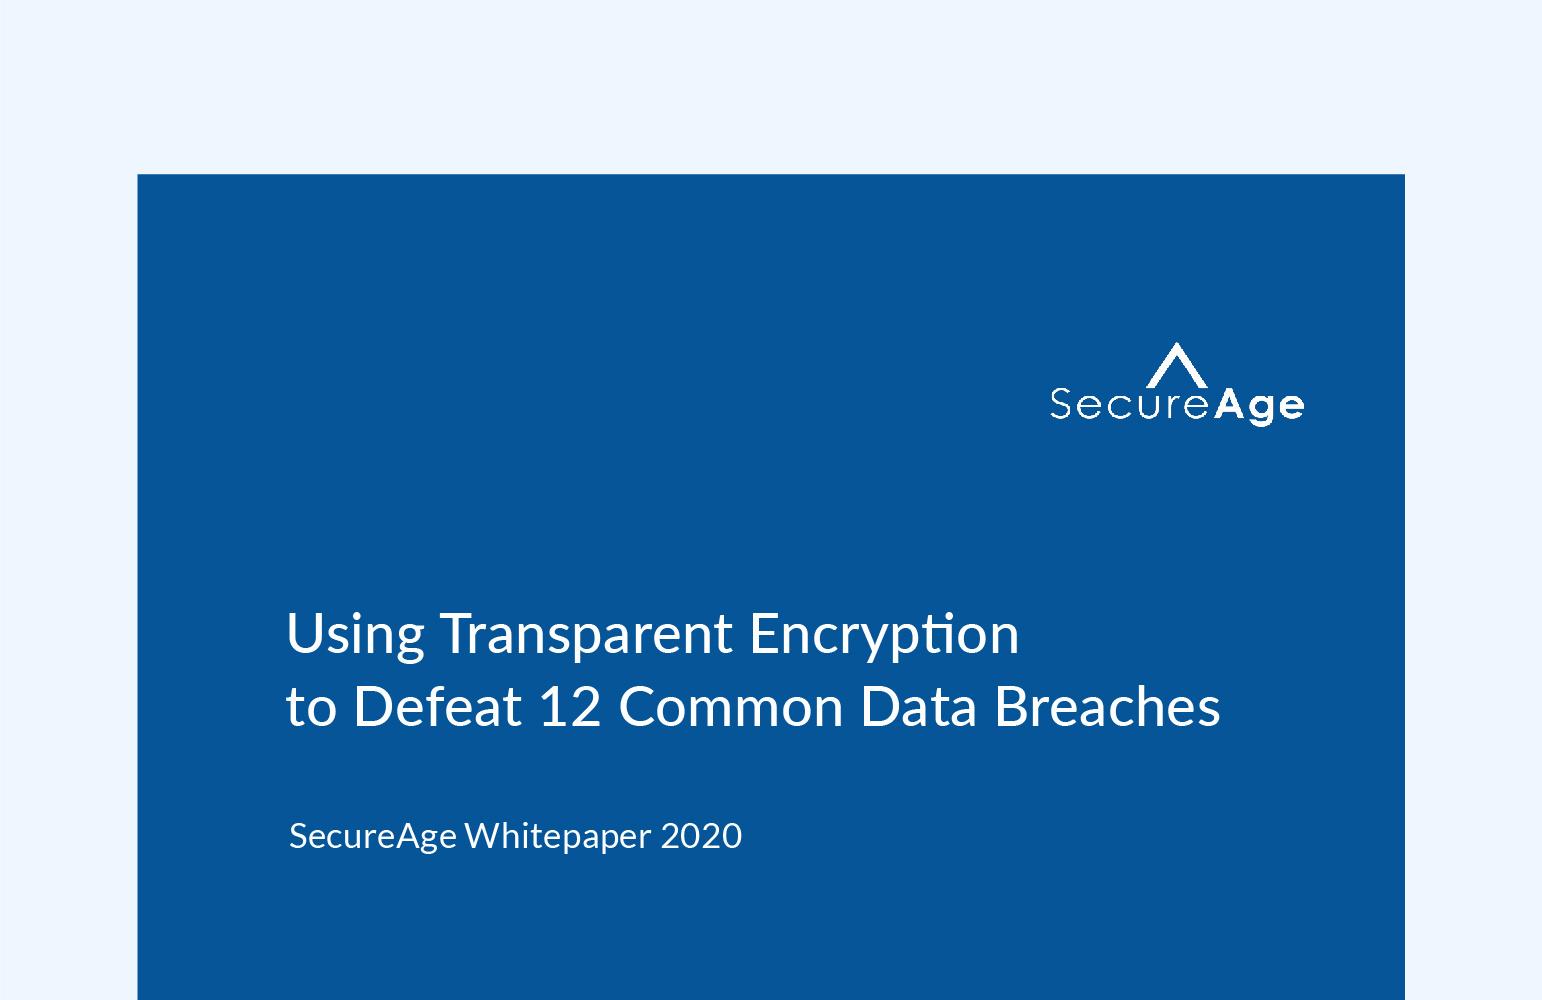 Using Transparent Encryption to Defeat 12 Common Data Breaches